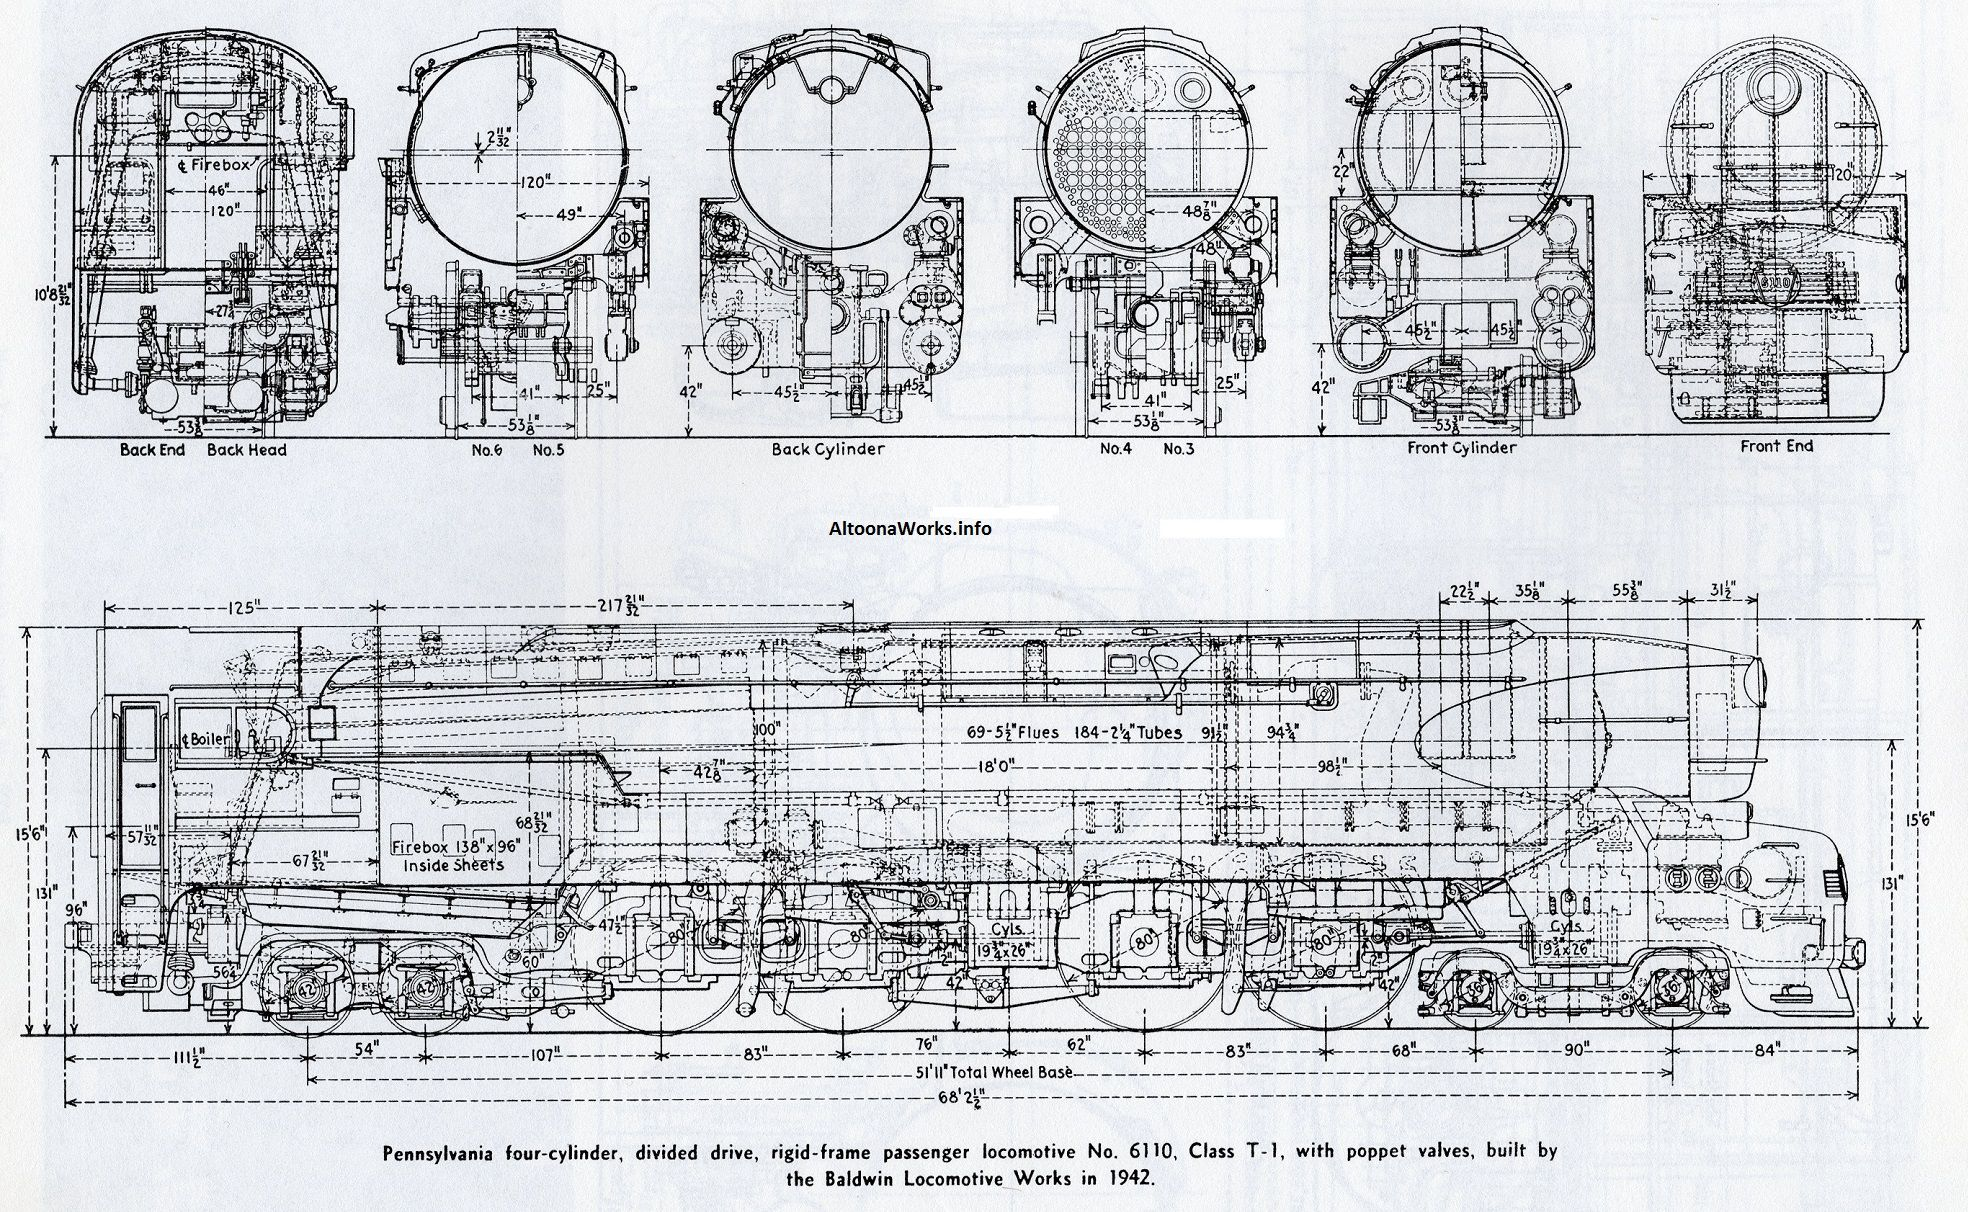 medium resolution of pennsylvania t 1 4 4 4 4 baldwin 1942 locomotive cutaways prr barge diagram